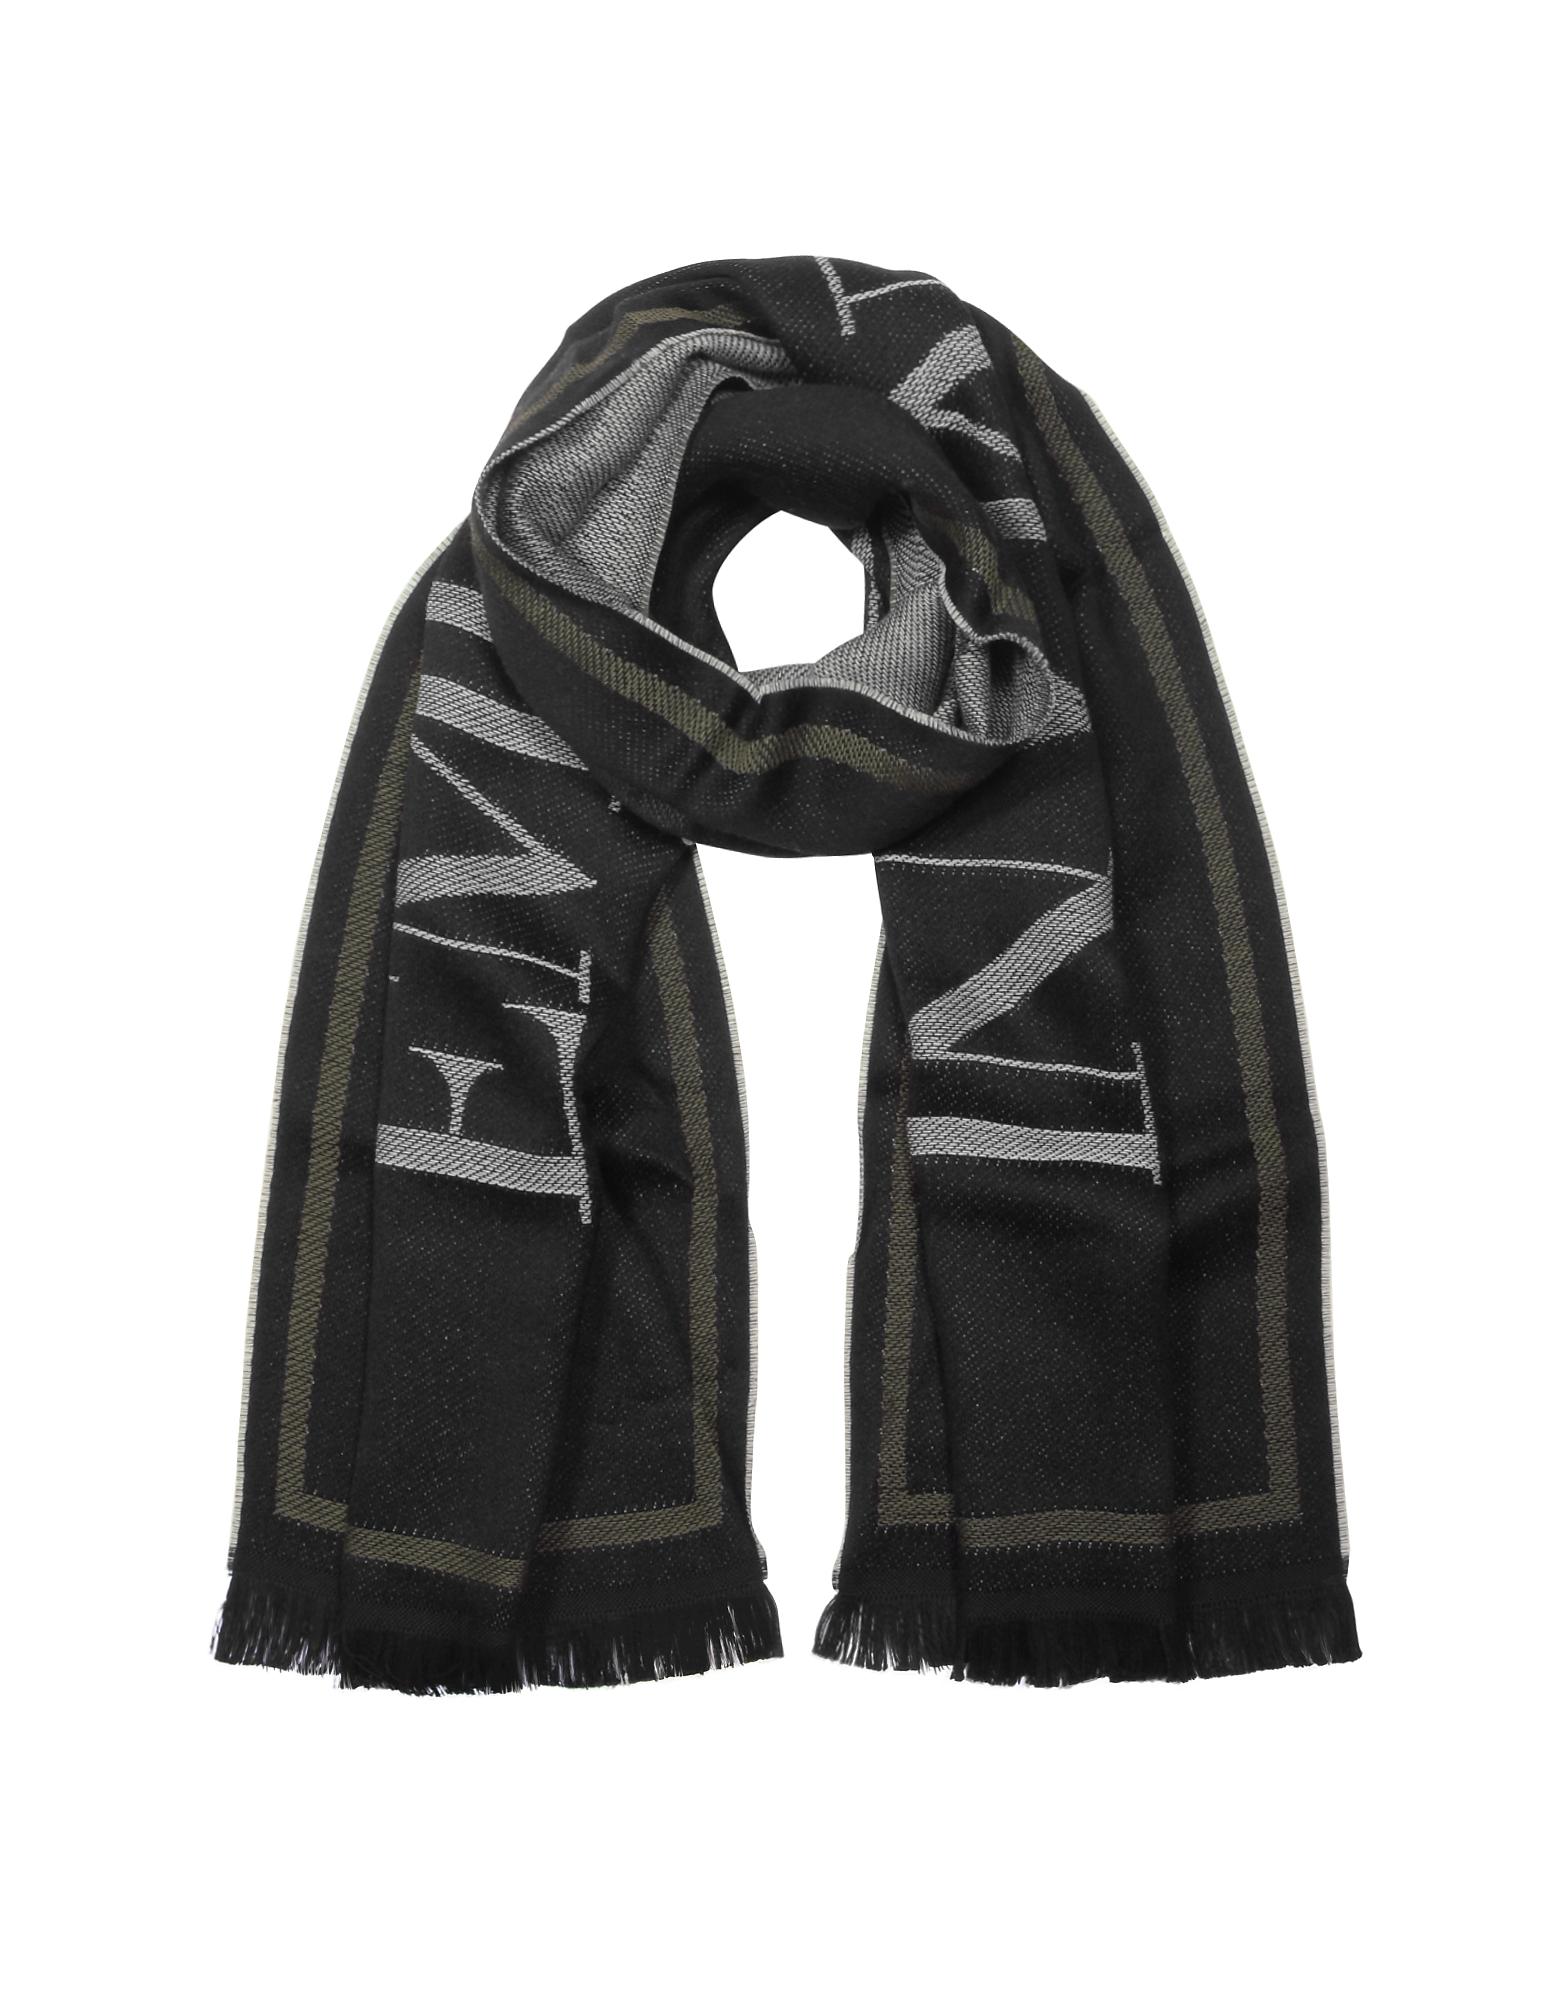 Black Woven Signature Wool Blend Men's Scarf